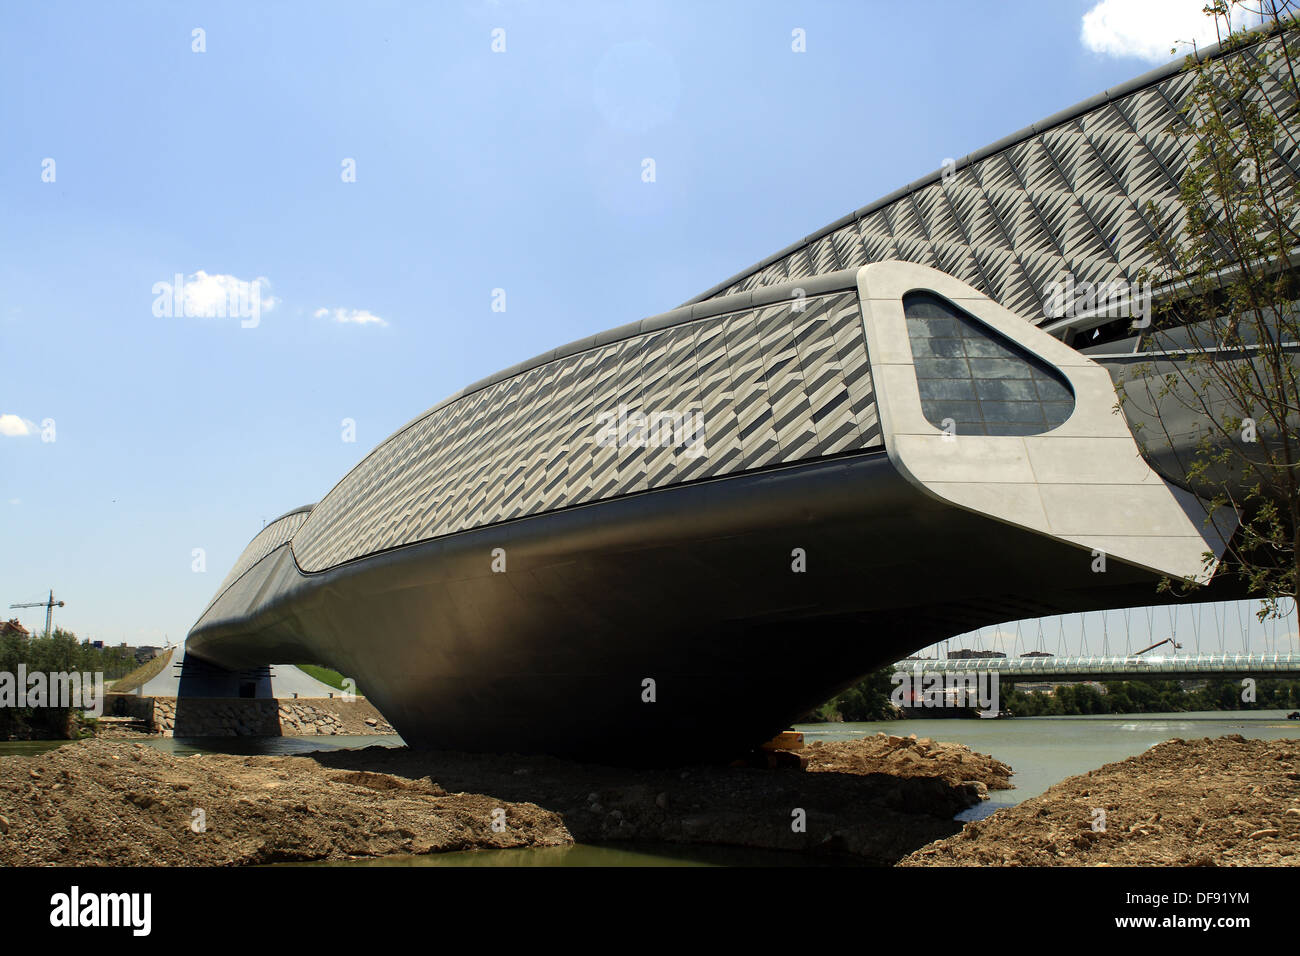 Bridge Pavilion designed by architect Zaha Hadid, Expo Zaragoza 2008. Zaragoza, Aragon, Spain Stock Photo